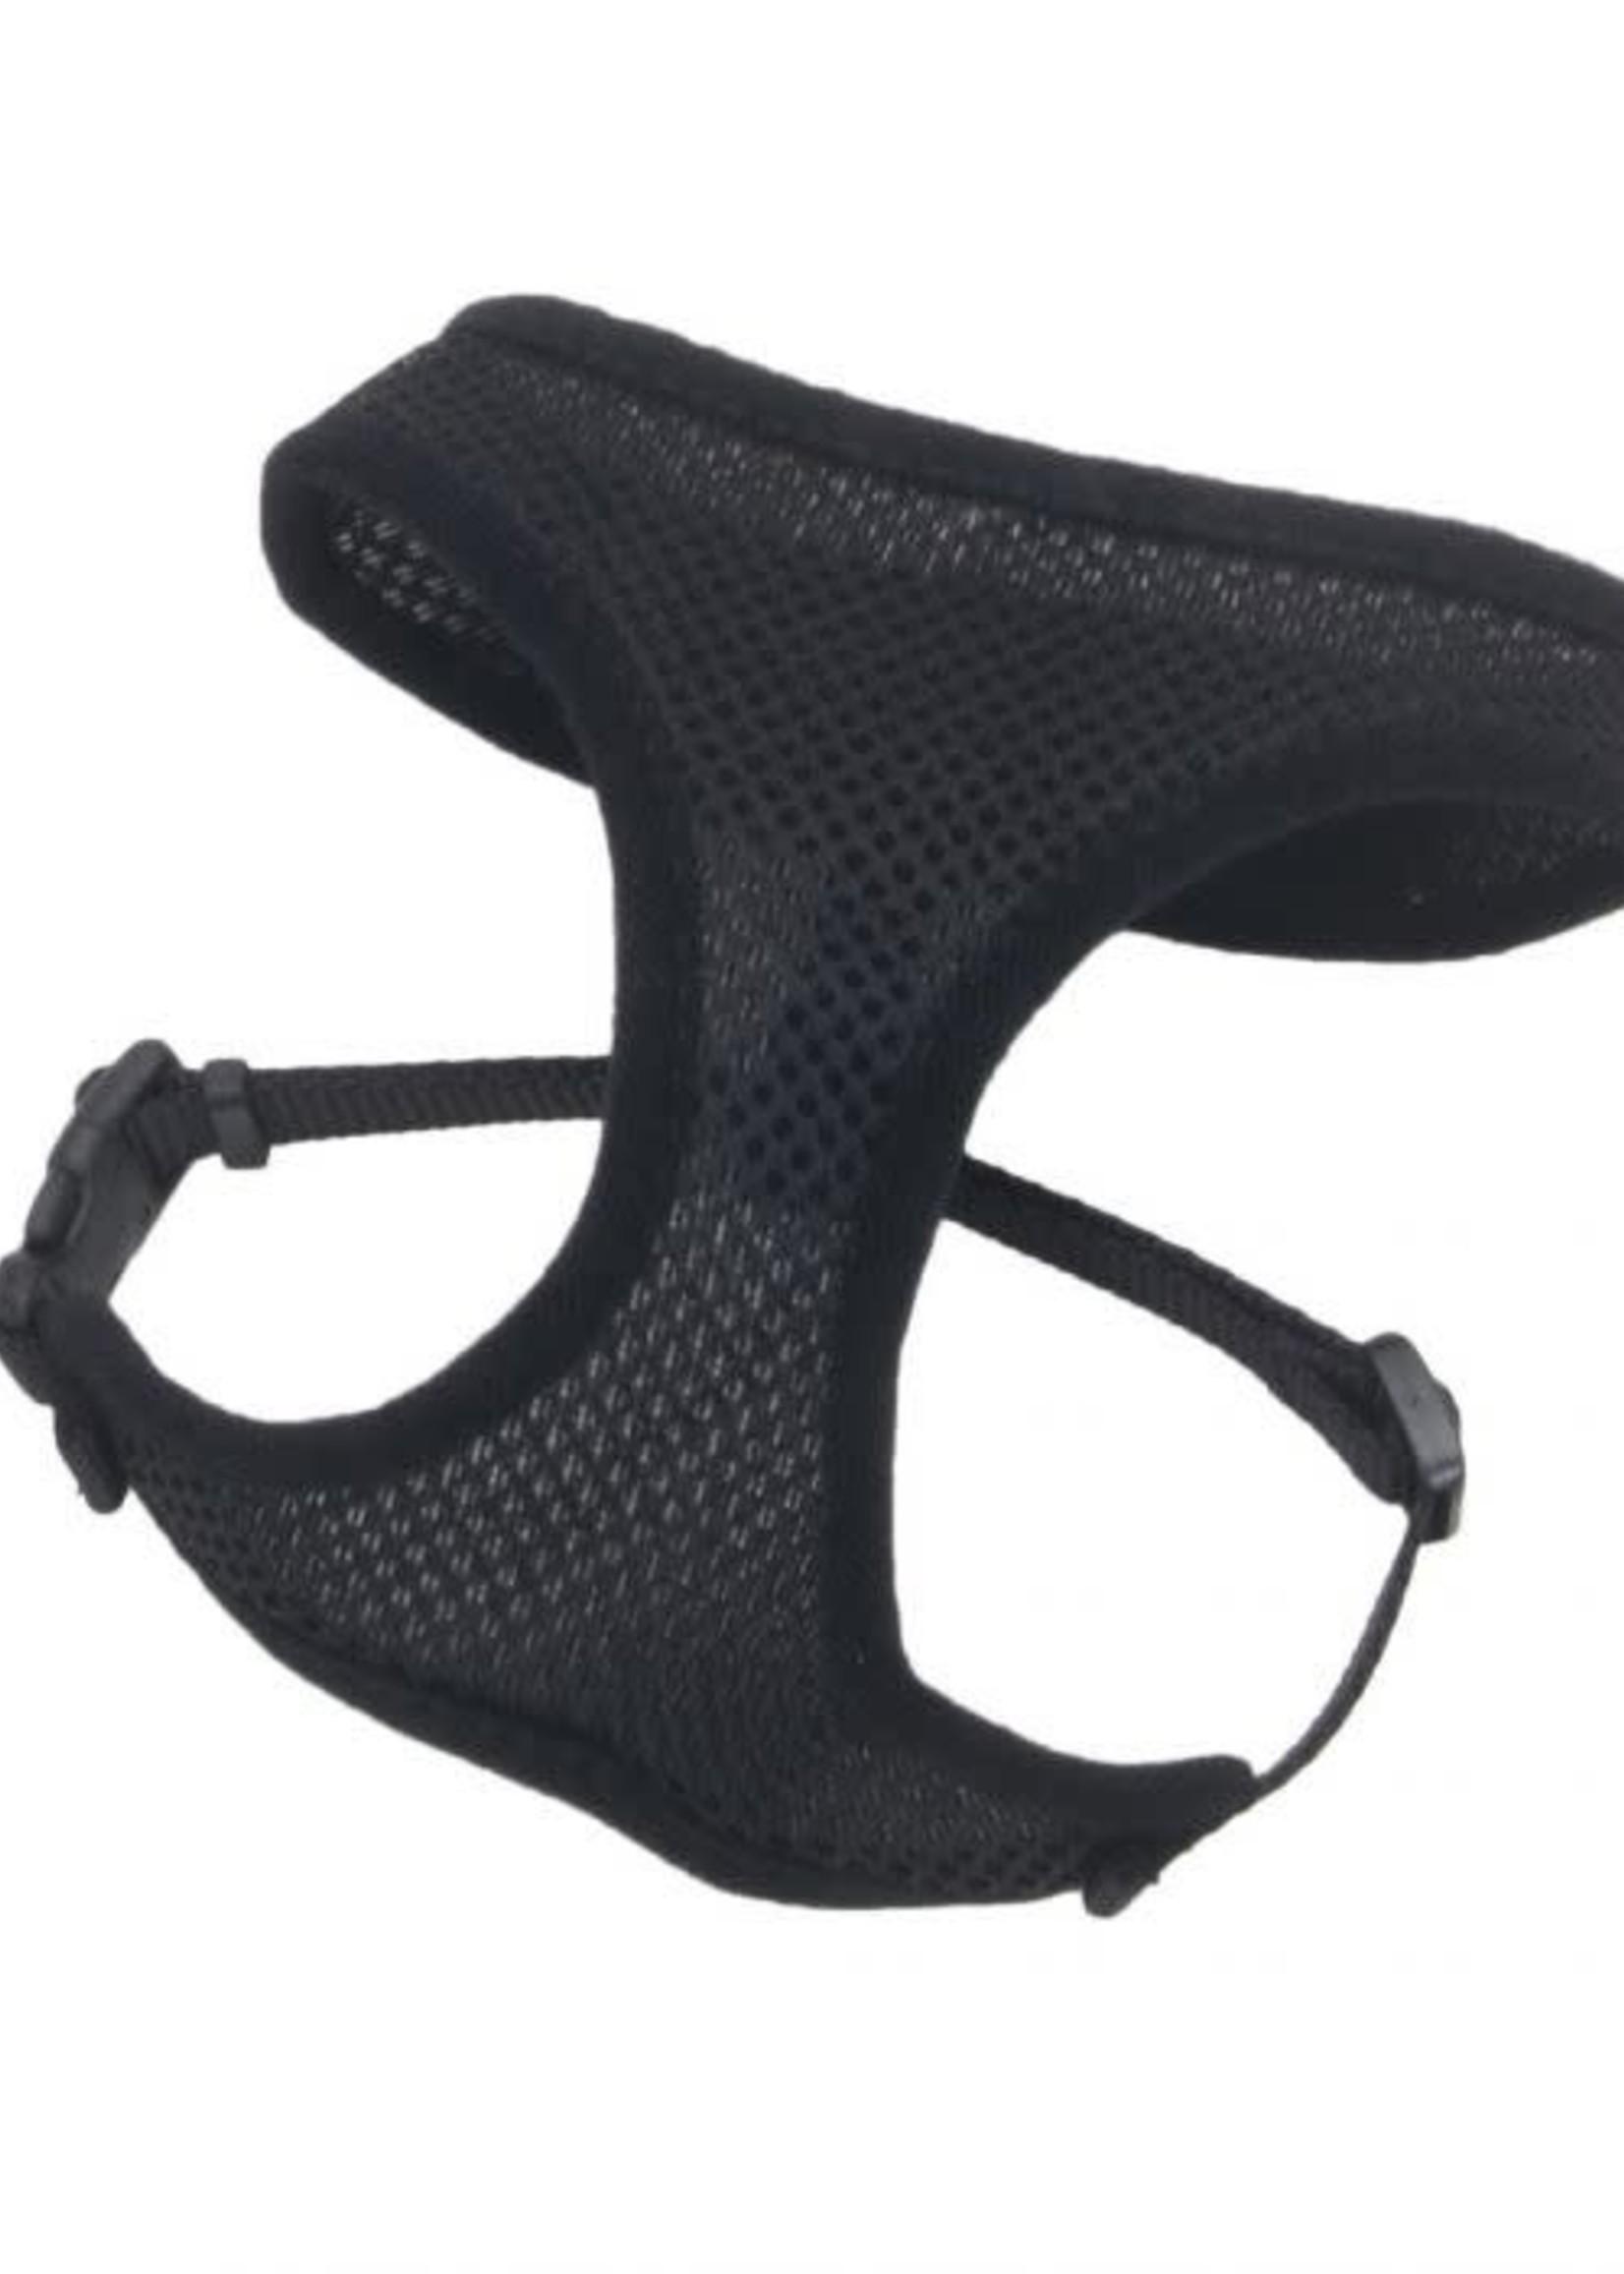 Comfort Soft® Comfort Soft® Adjustable Harness X-Small